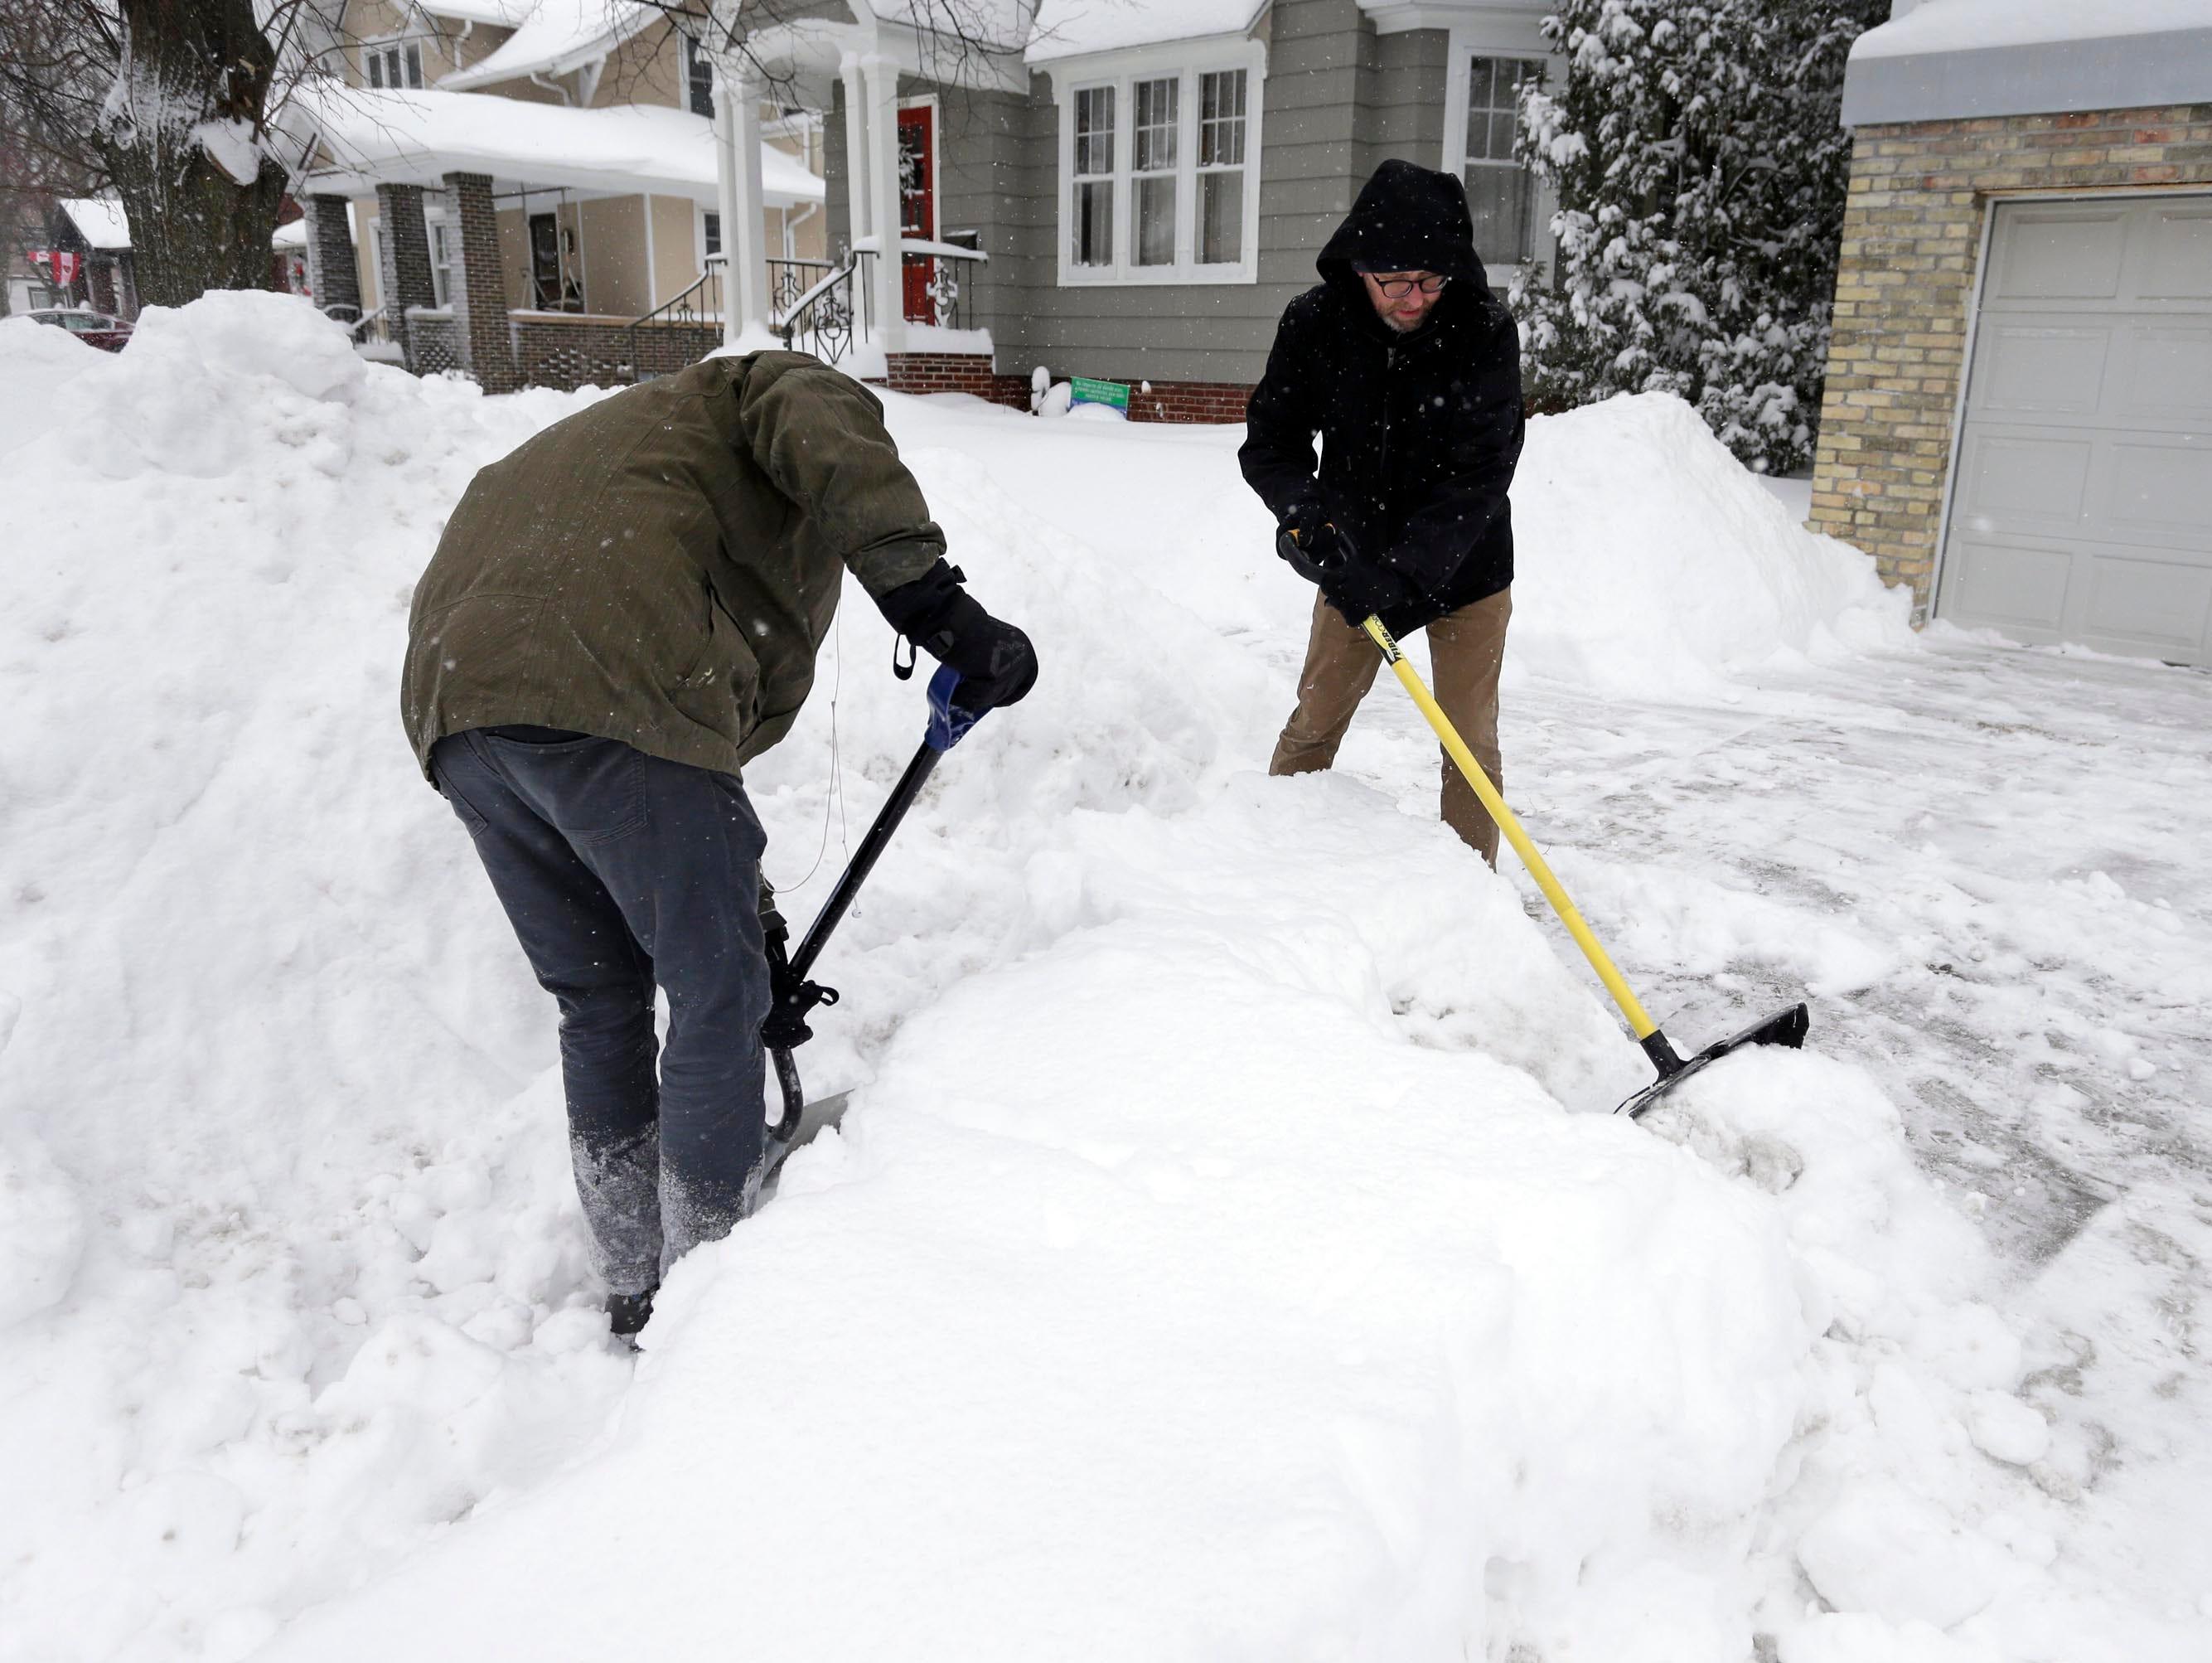 Elijah Watson, left, and David Hein, both of Sheboygan, Wis., shovel the end of the driveway by Hein's home Monday, Jan. 28, 2019, in Sheboygan, Wis.